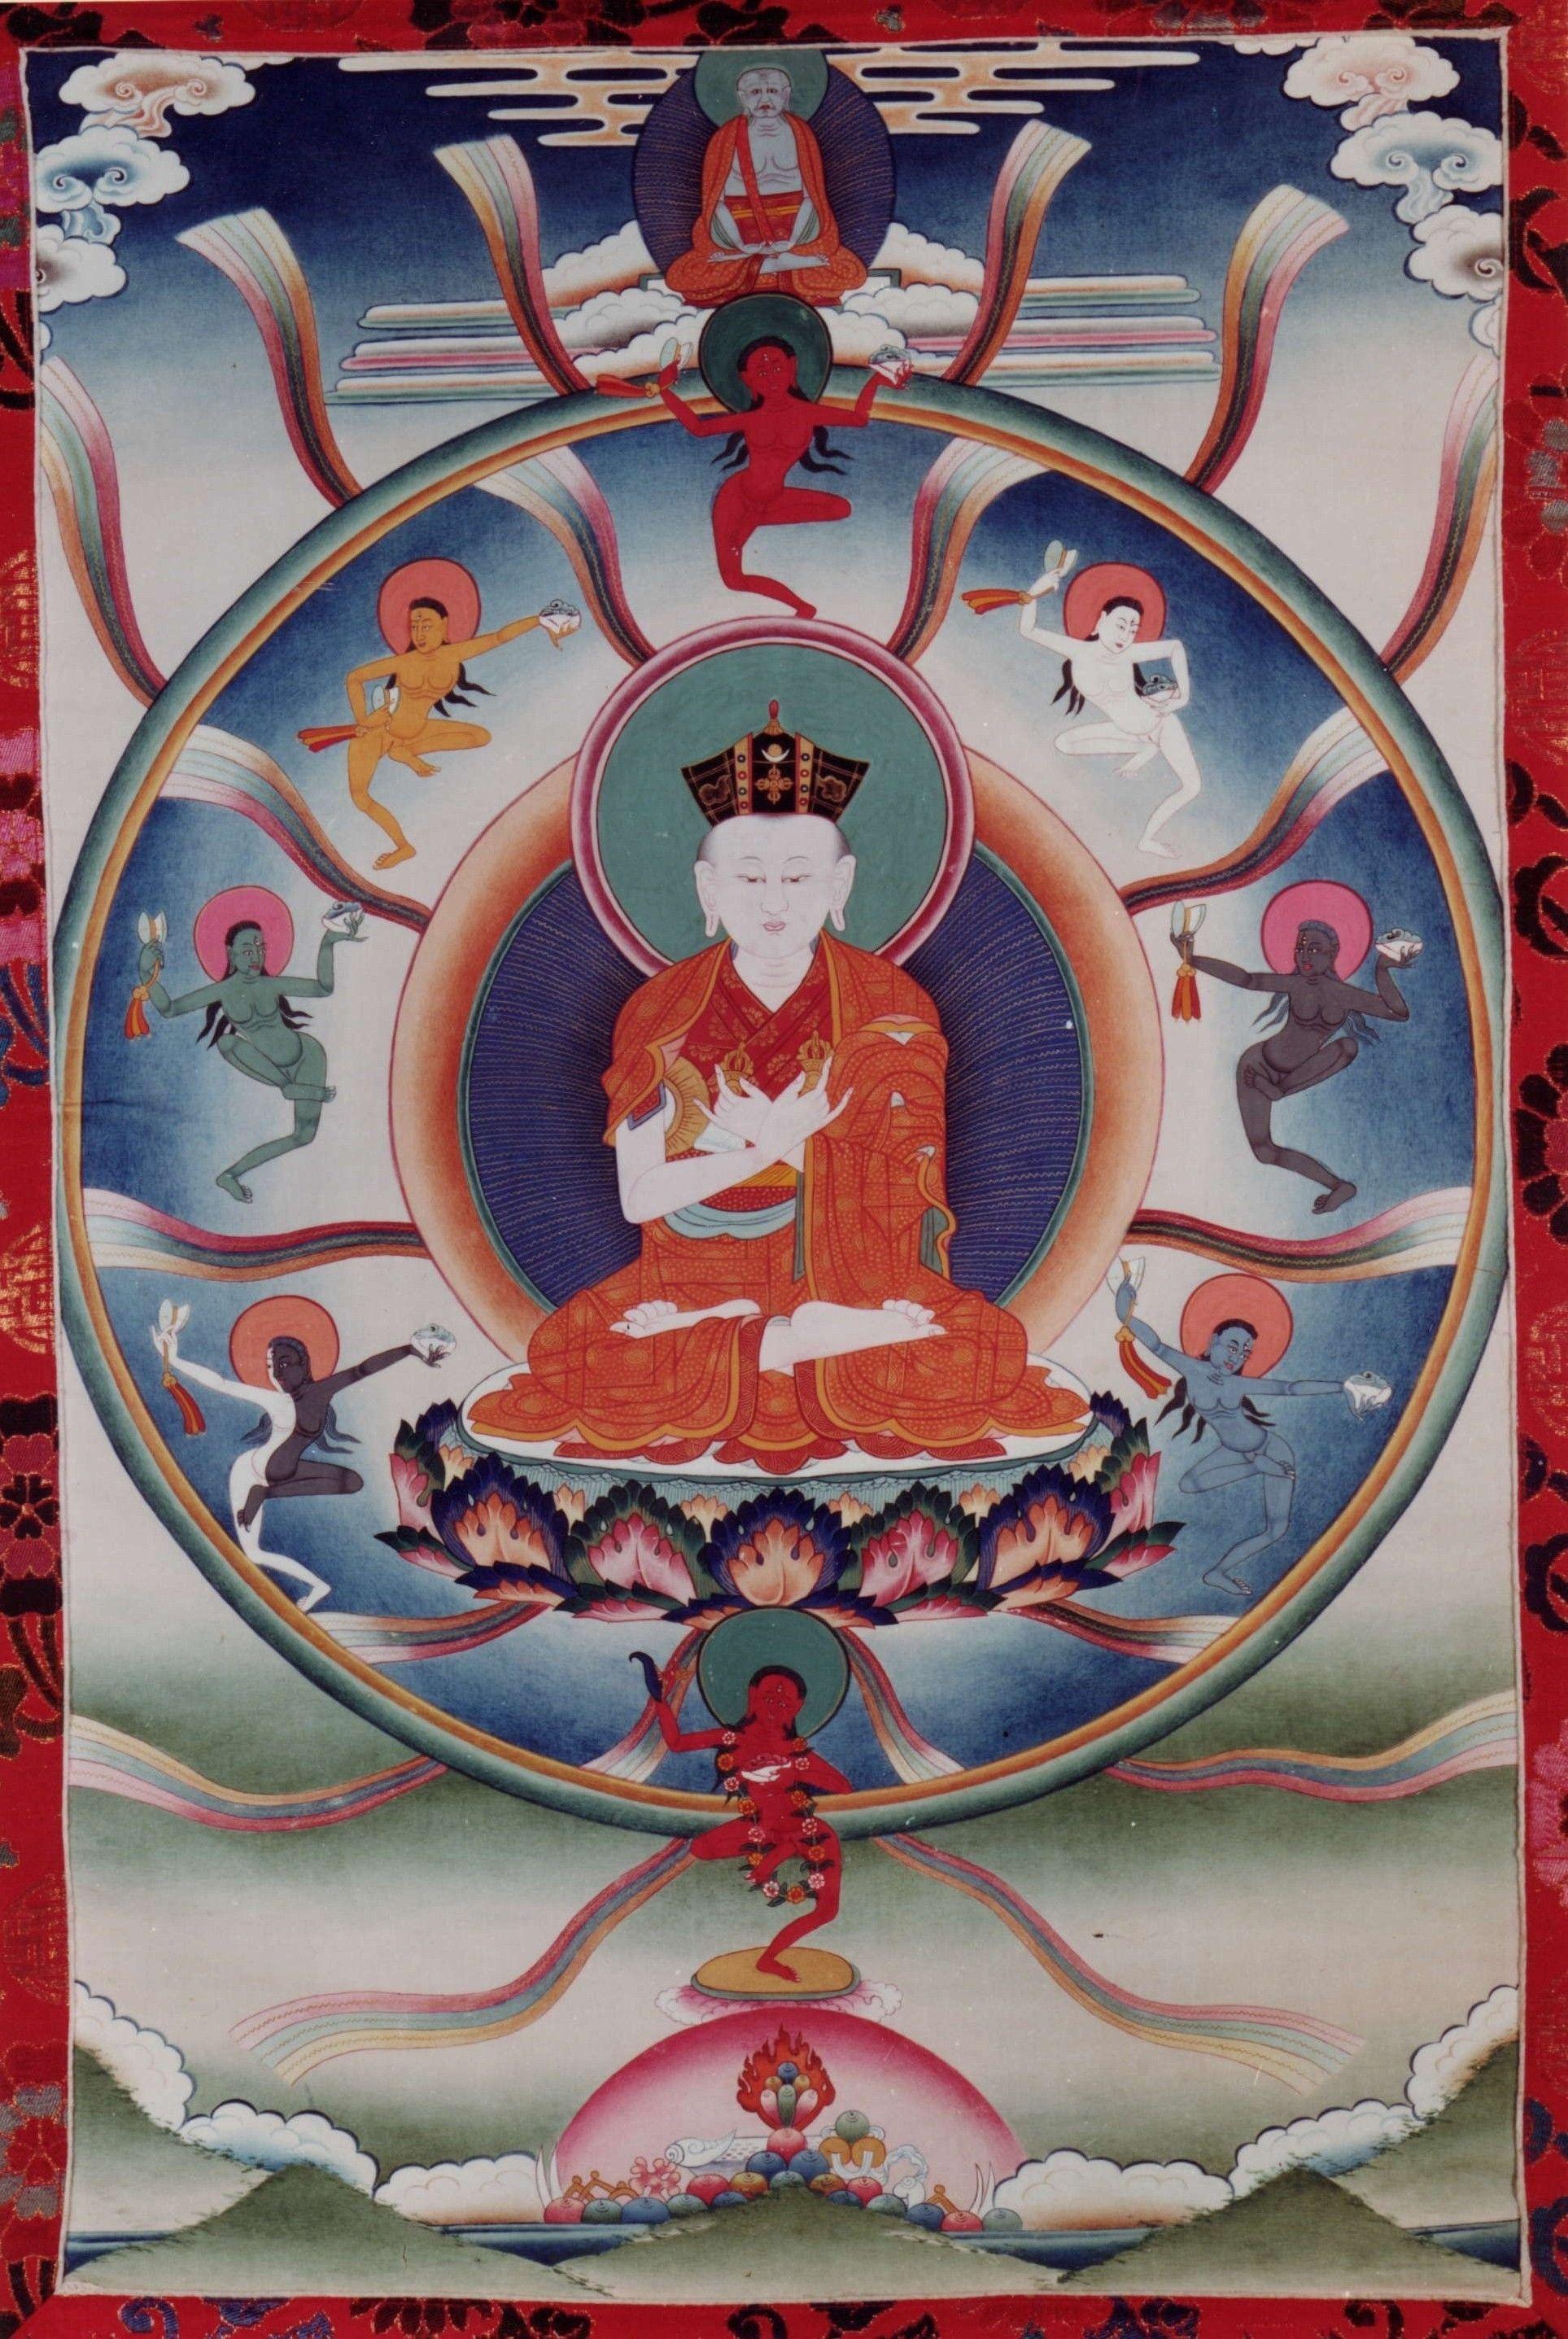 Miky Dorje, The Eighth Karmapa